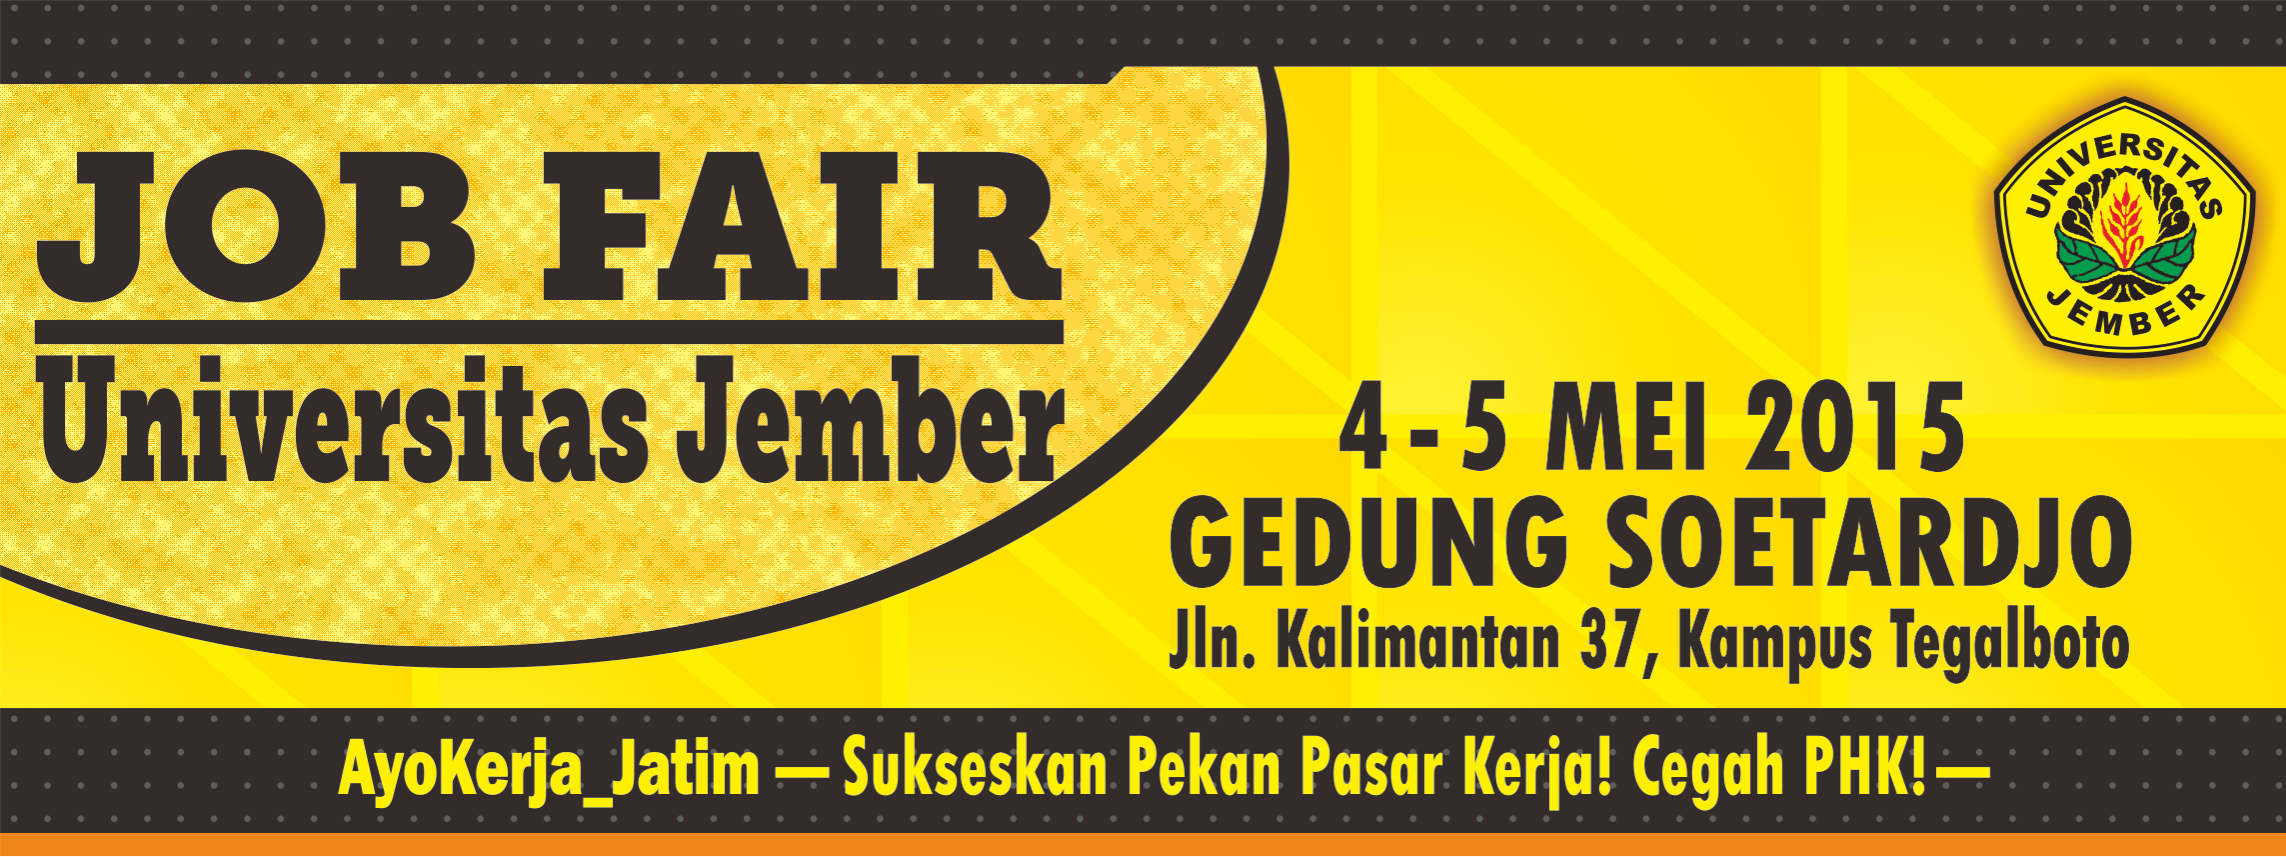 Spanduk Job Fair Sesi I 2015 website